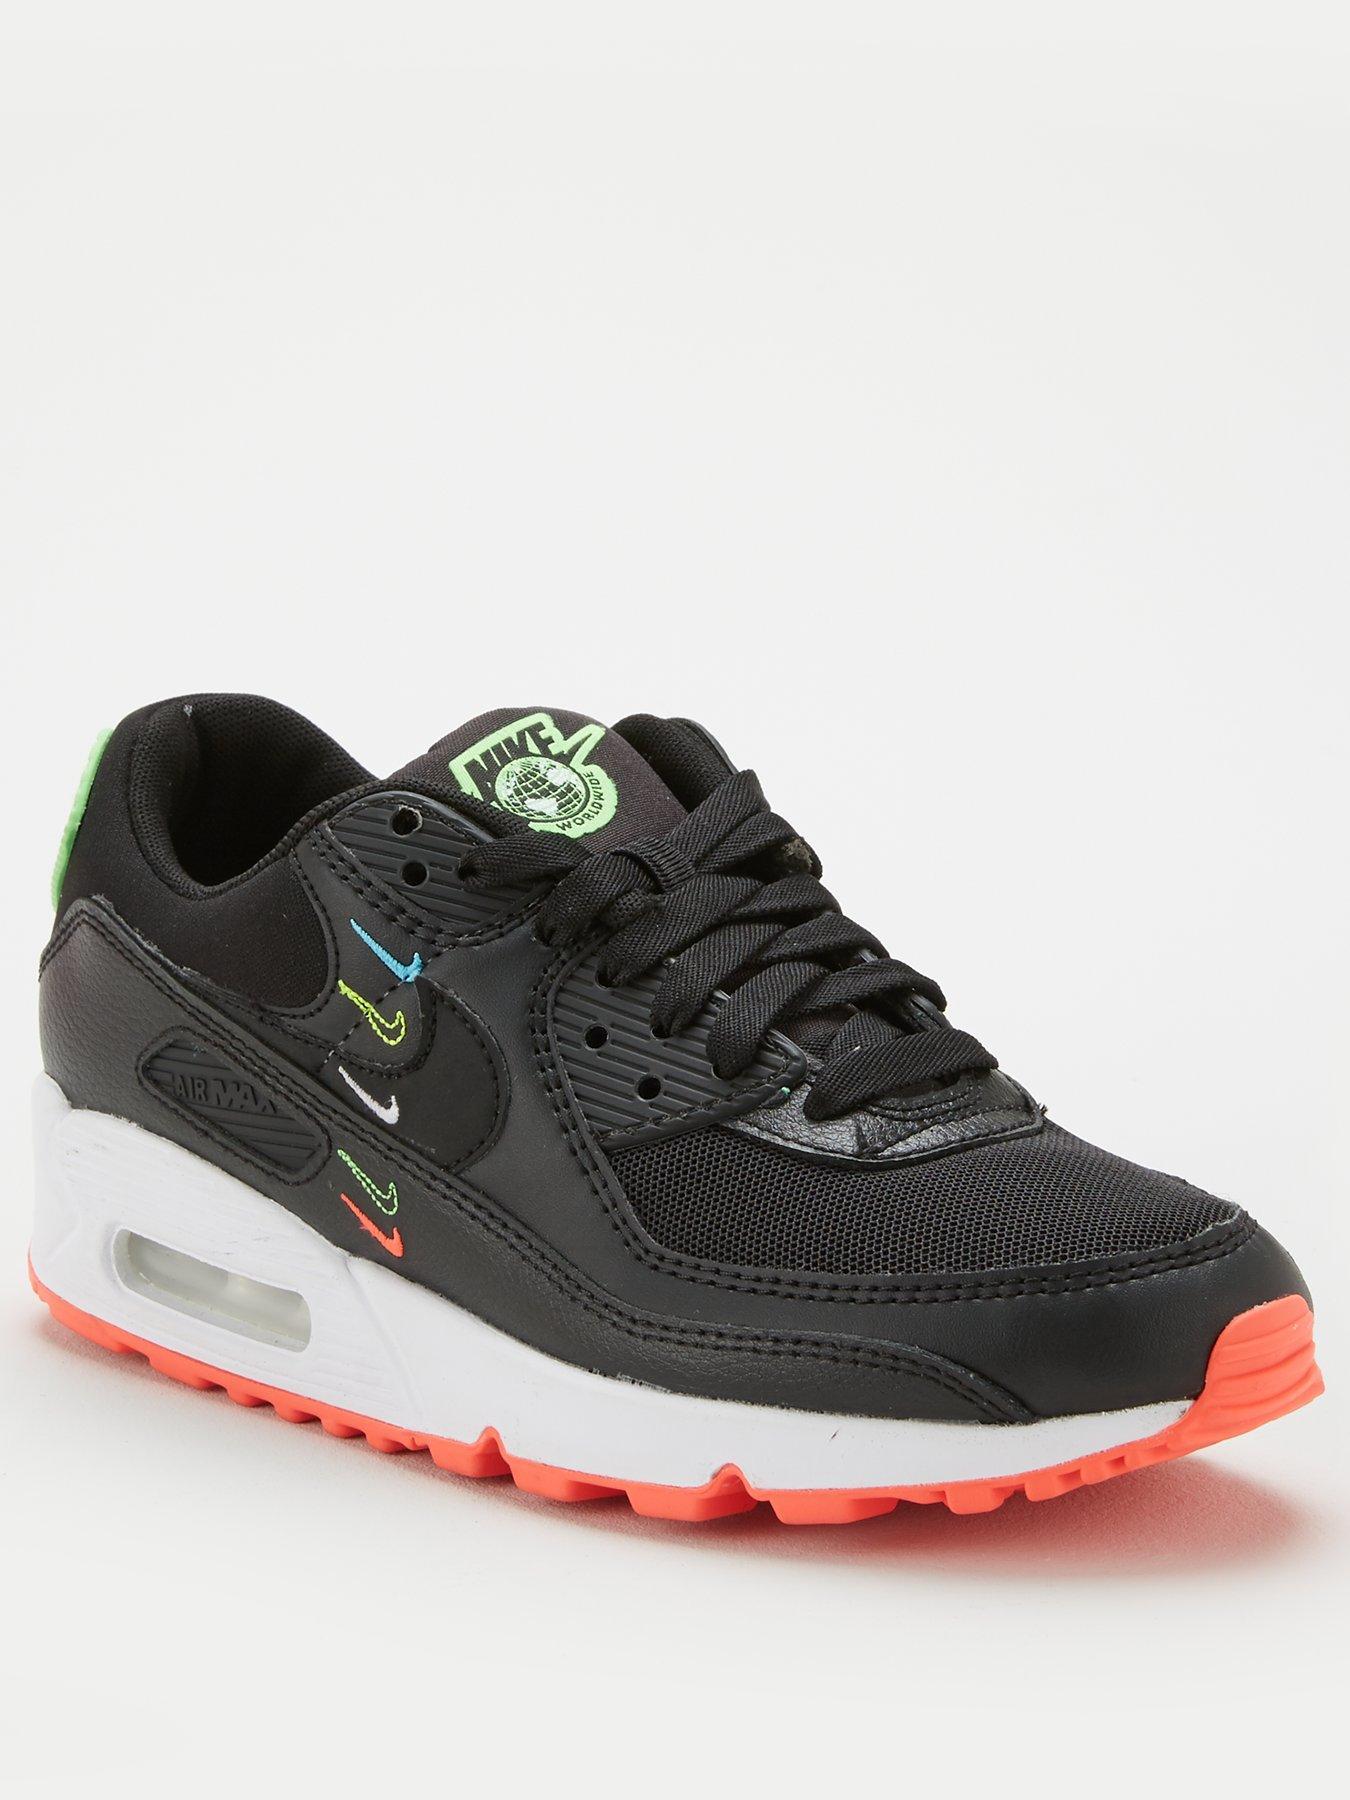 buy nike shoes uk